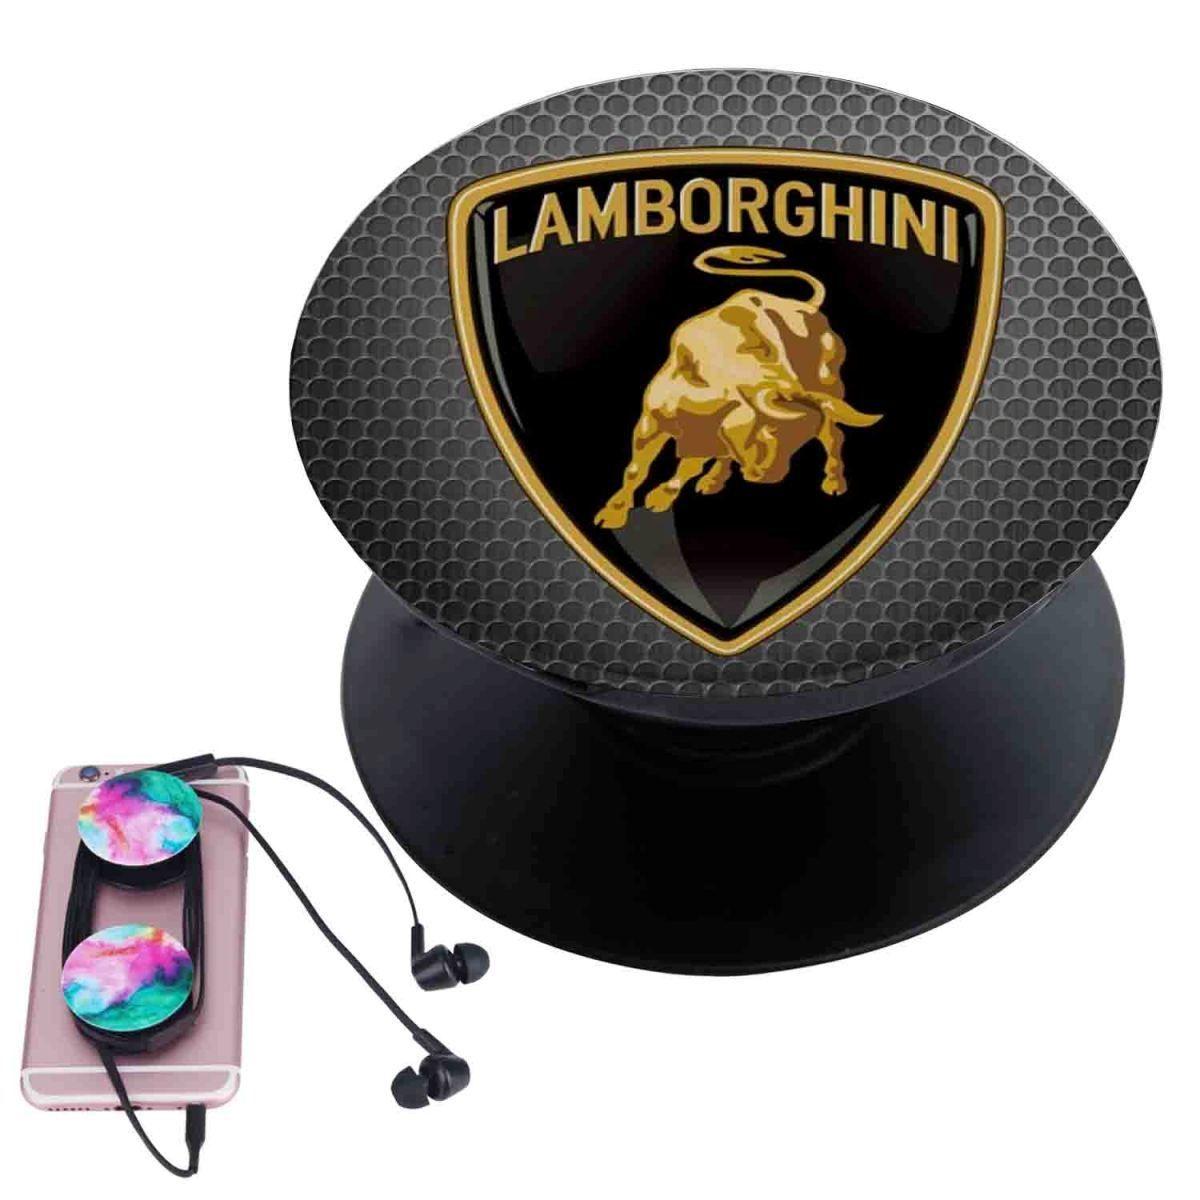 Lamborghini Custom Popsocket Pop Out Grip Stand Pop Socket For